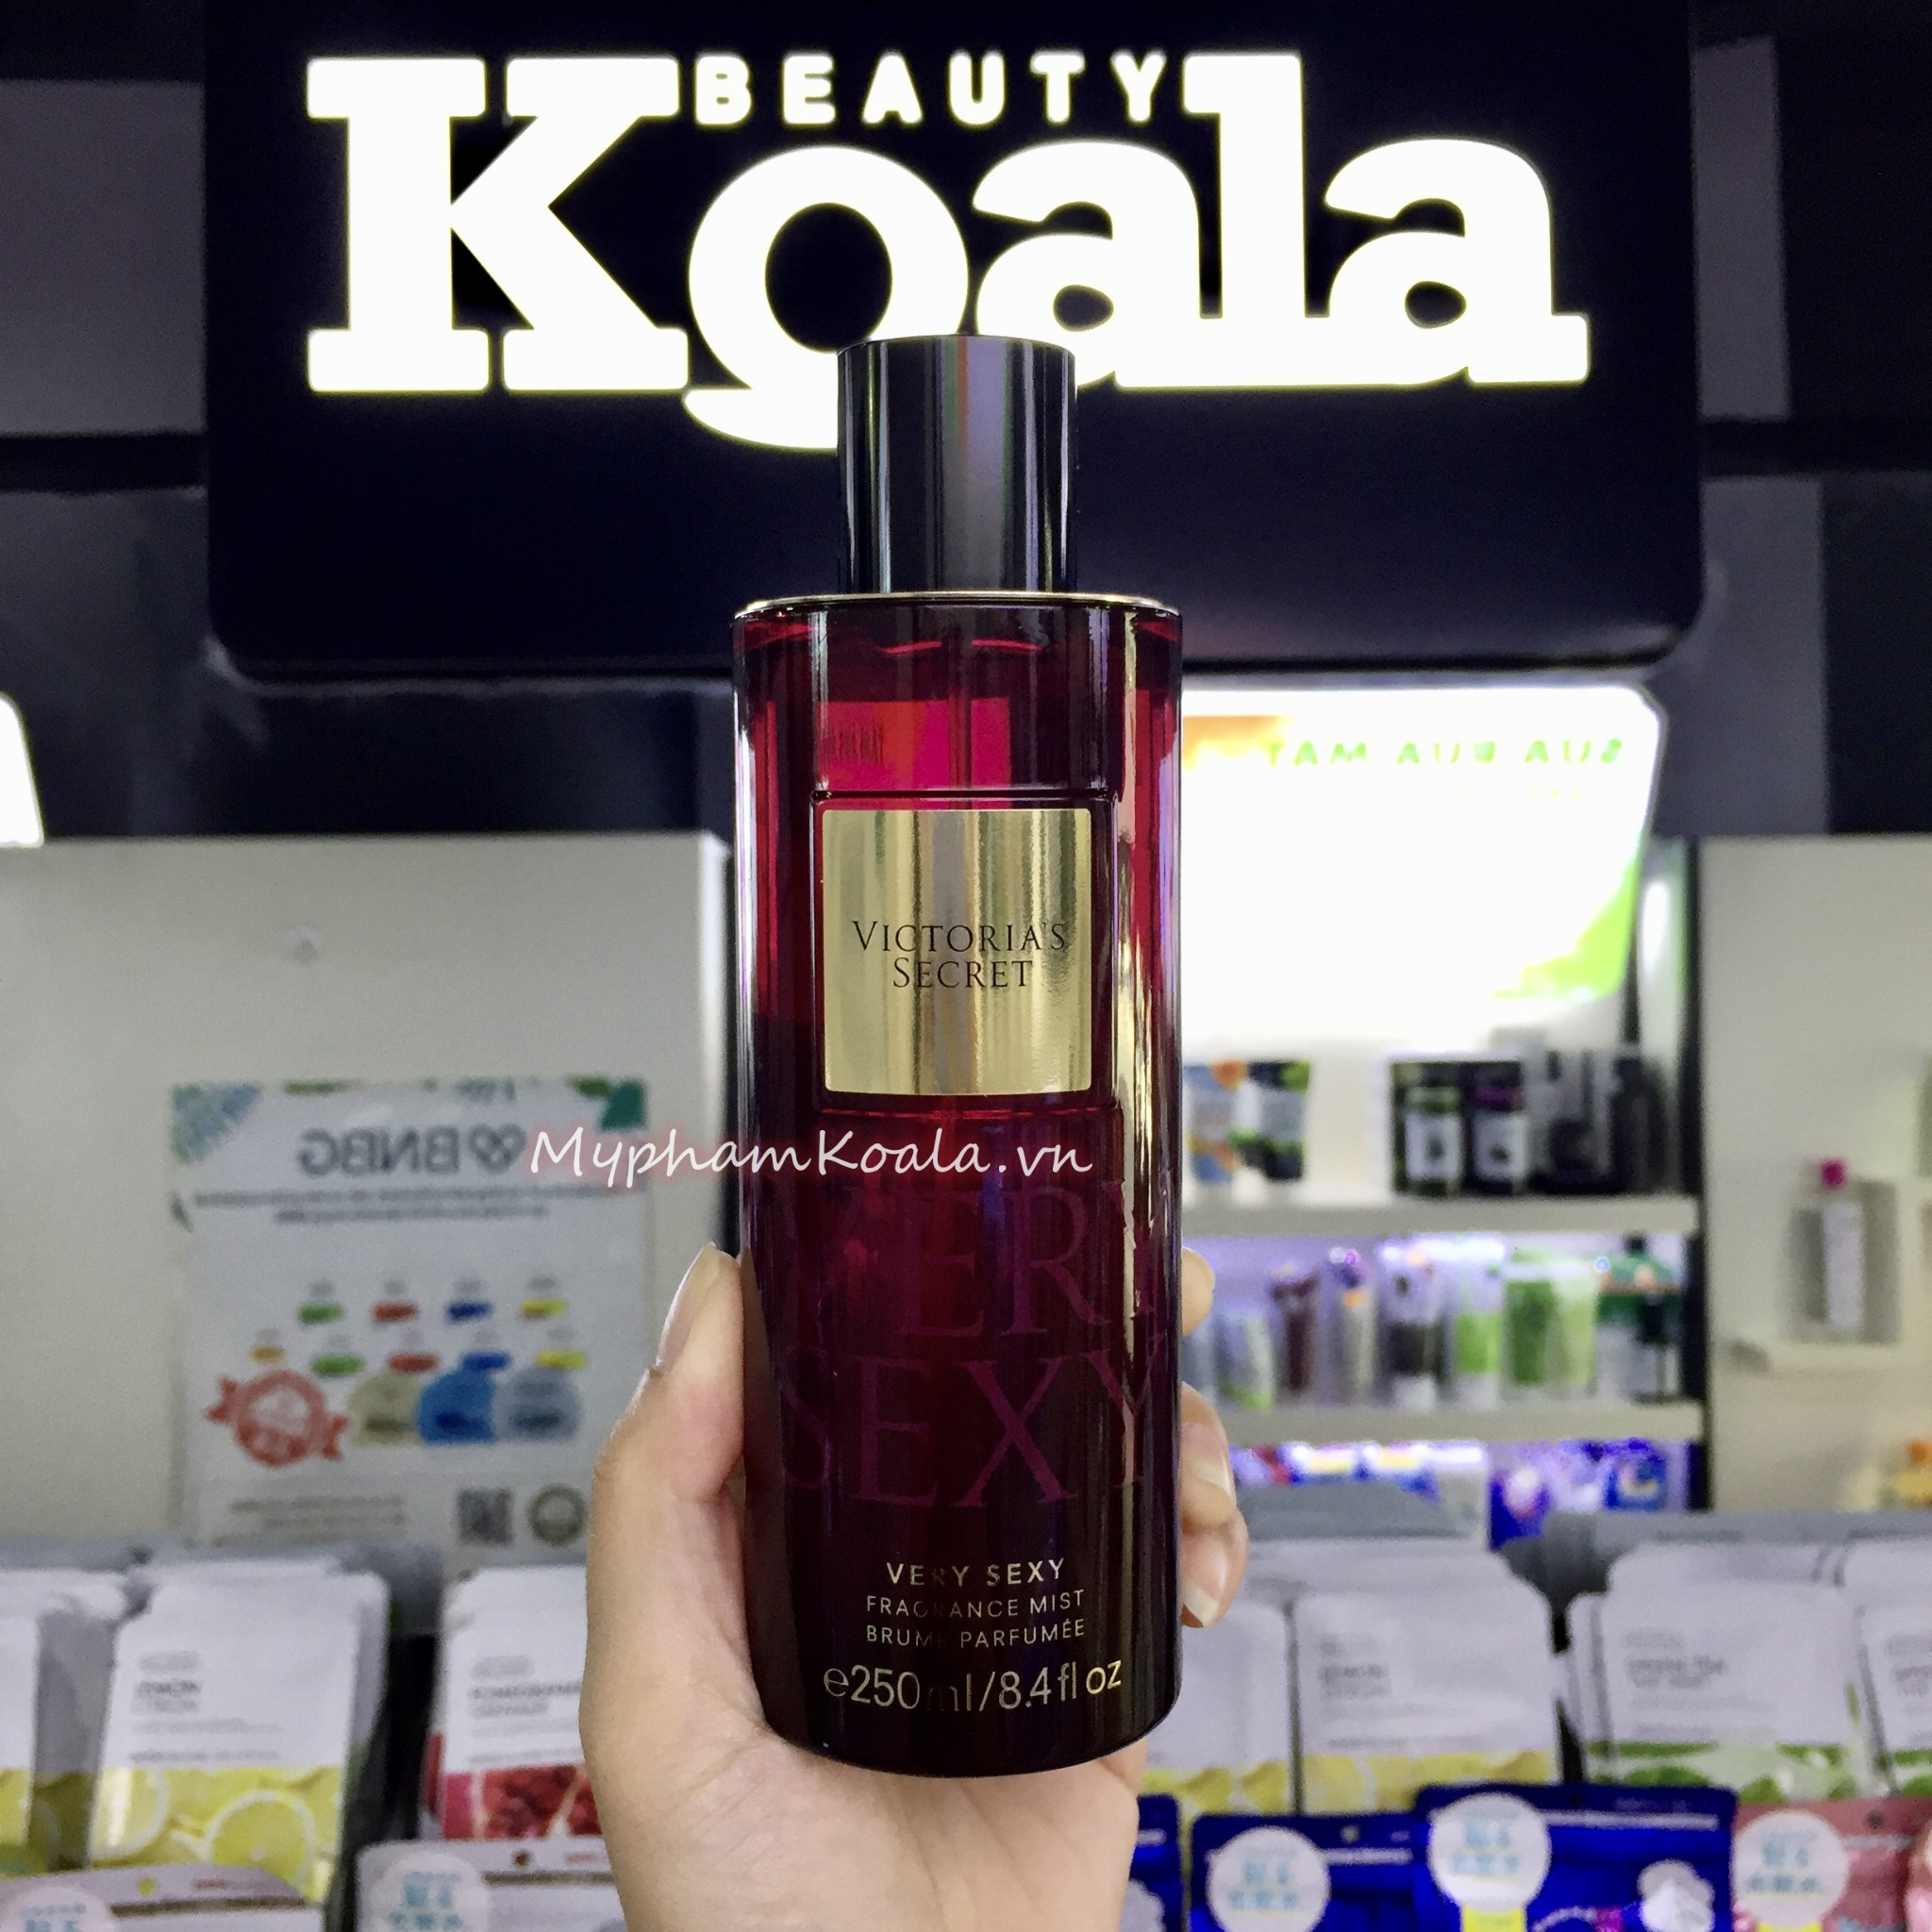 Xịt Thơm Victoria Secret Very Sexy Fragrance Mist Brume Parfumee 250ml